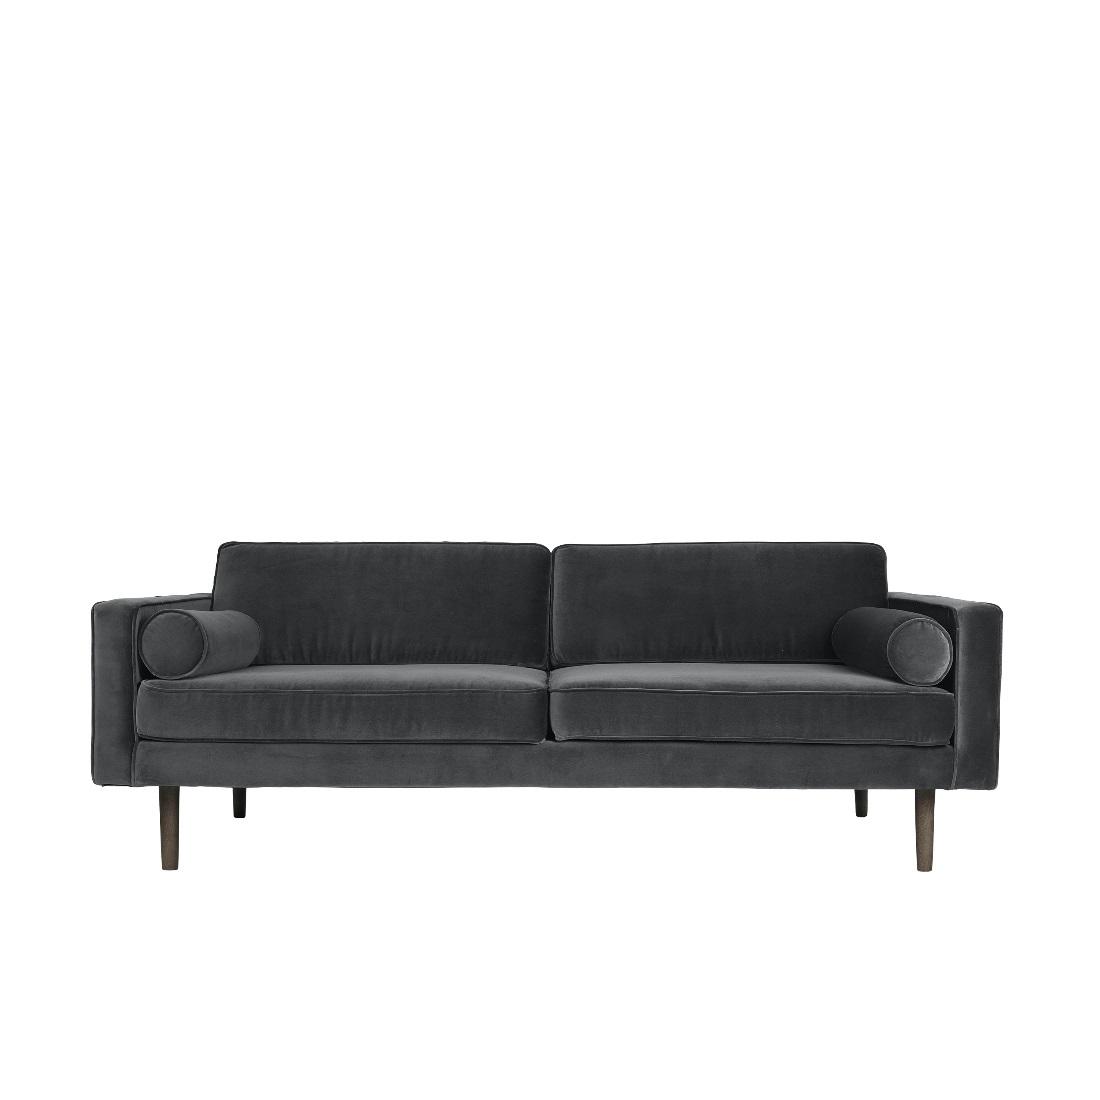 Soffa grå sammet VIND, Broste Copenhagen